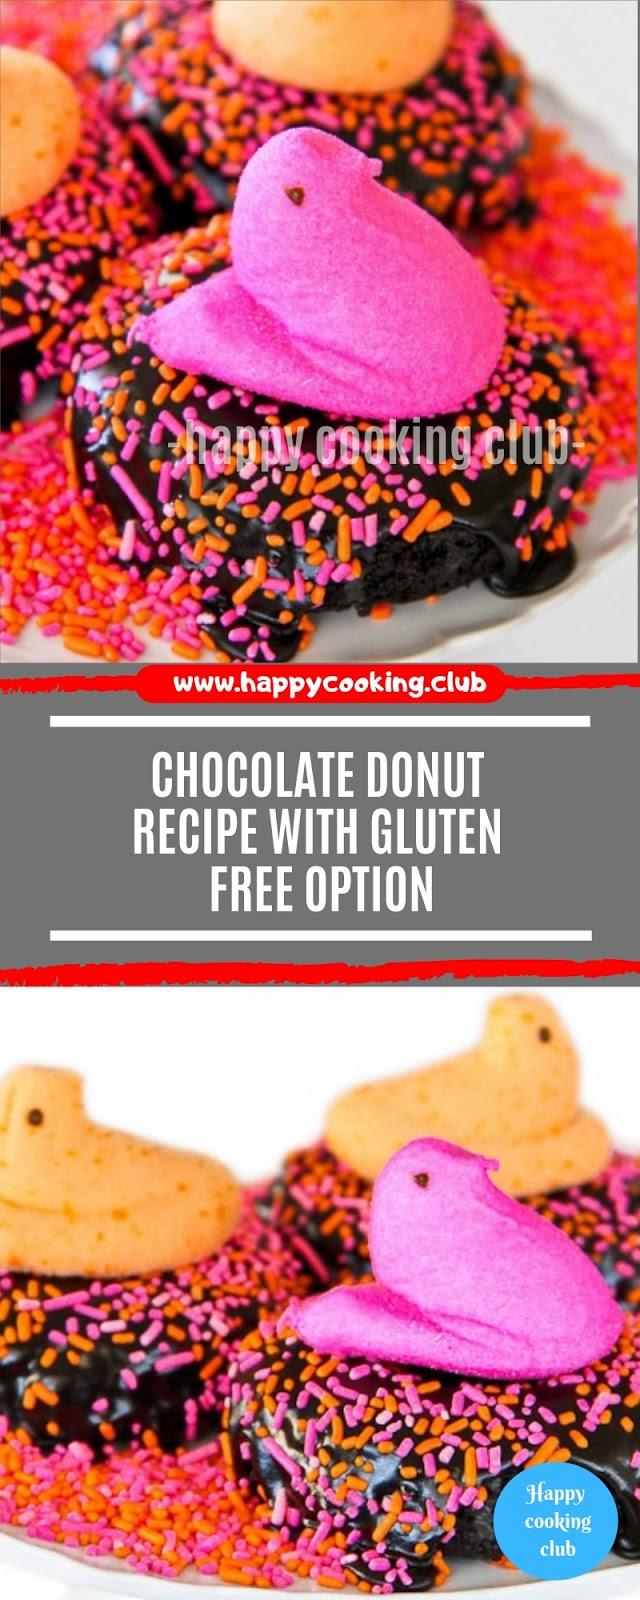 Chocolate Donut Recipe With Gluten Free Option